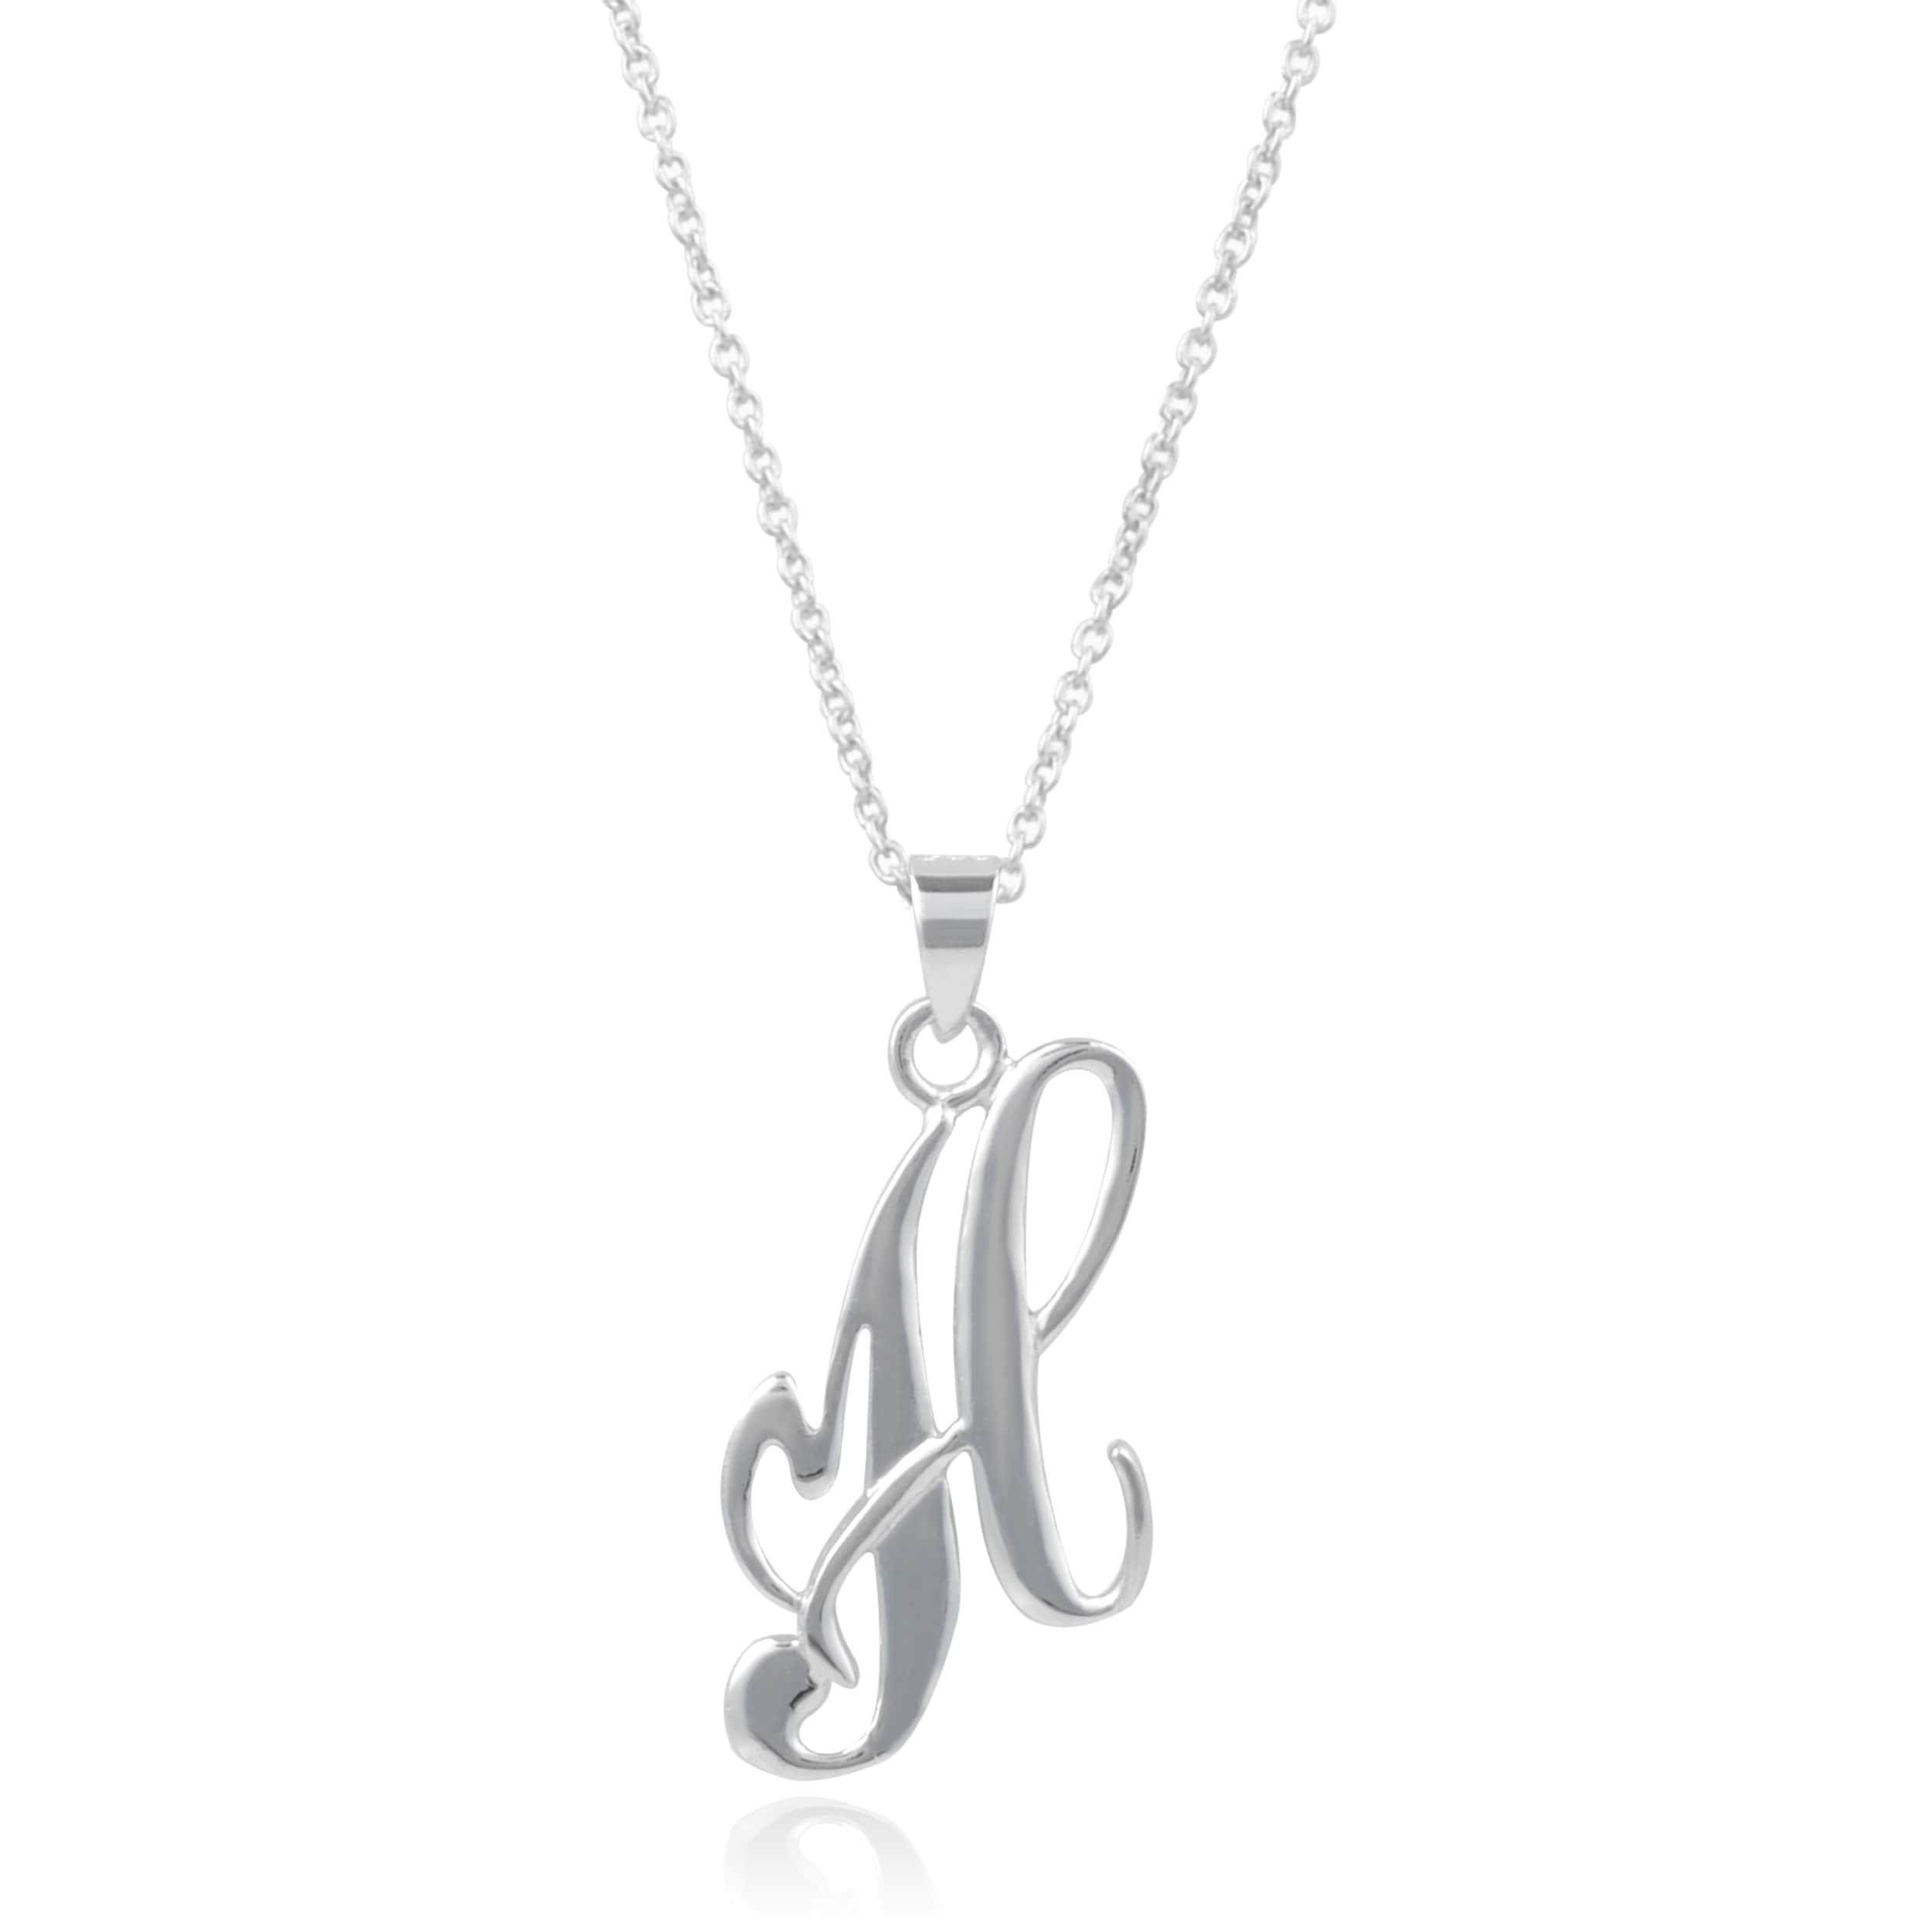 Sterling silver initial letter pendant necklace 18l free sterling silver initial letter pendant necklace 18l free shipping on orders over 45 overstock 16933080 aloadofball Gallery